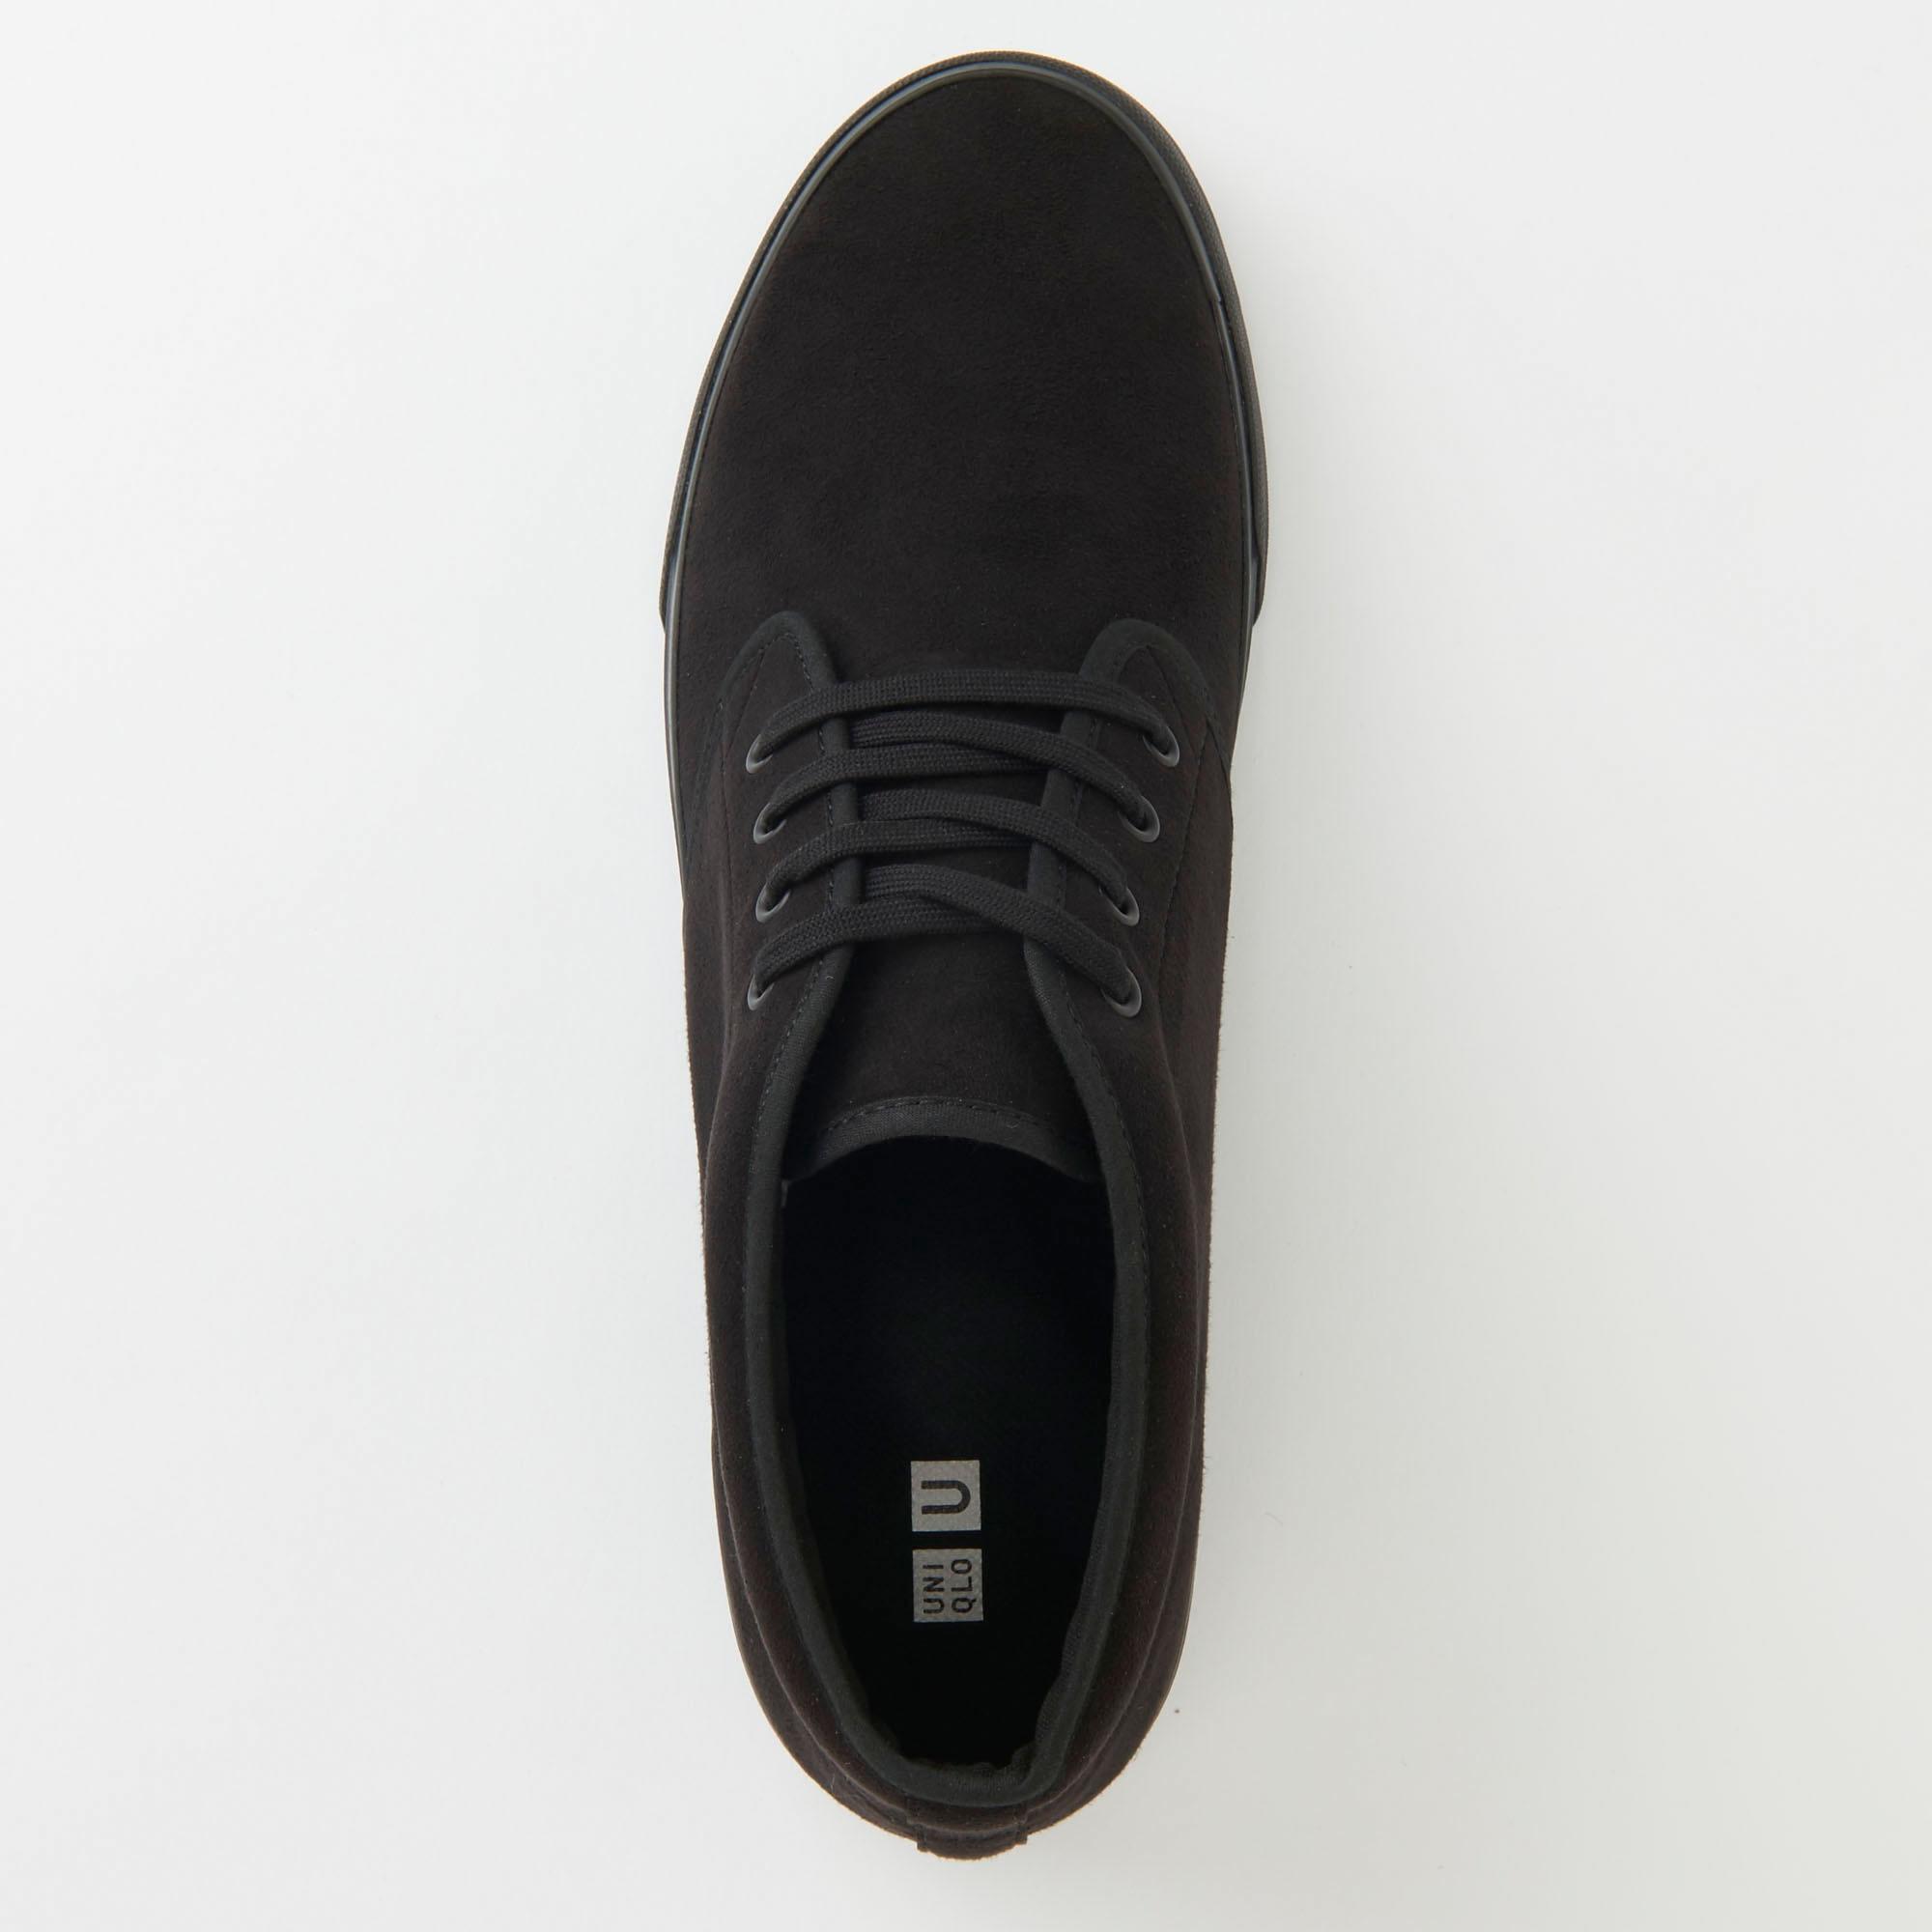 Uniqlo Homme U Chaussures Chaussures U Homme Uniqlo Uniqlo Chaussures iZPukX